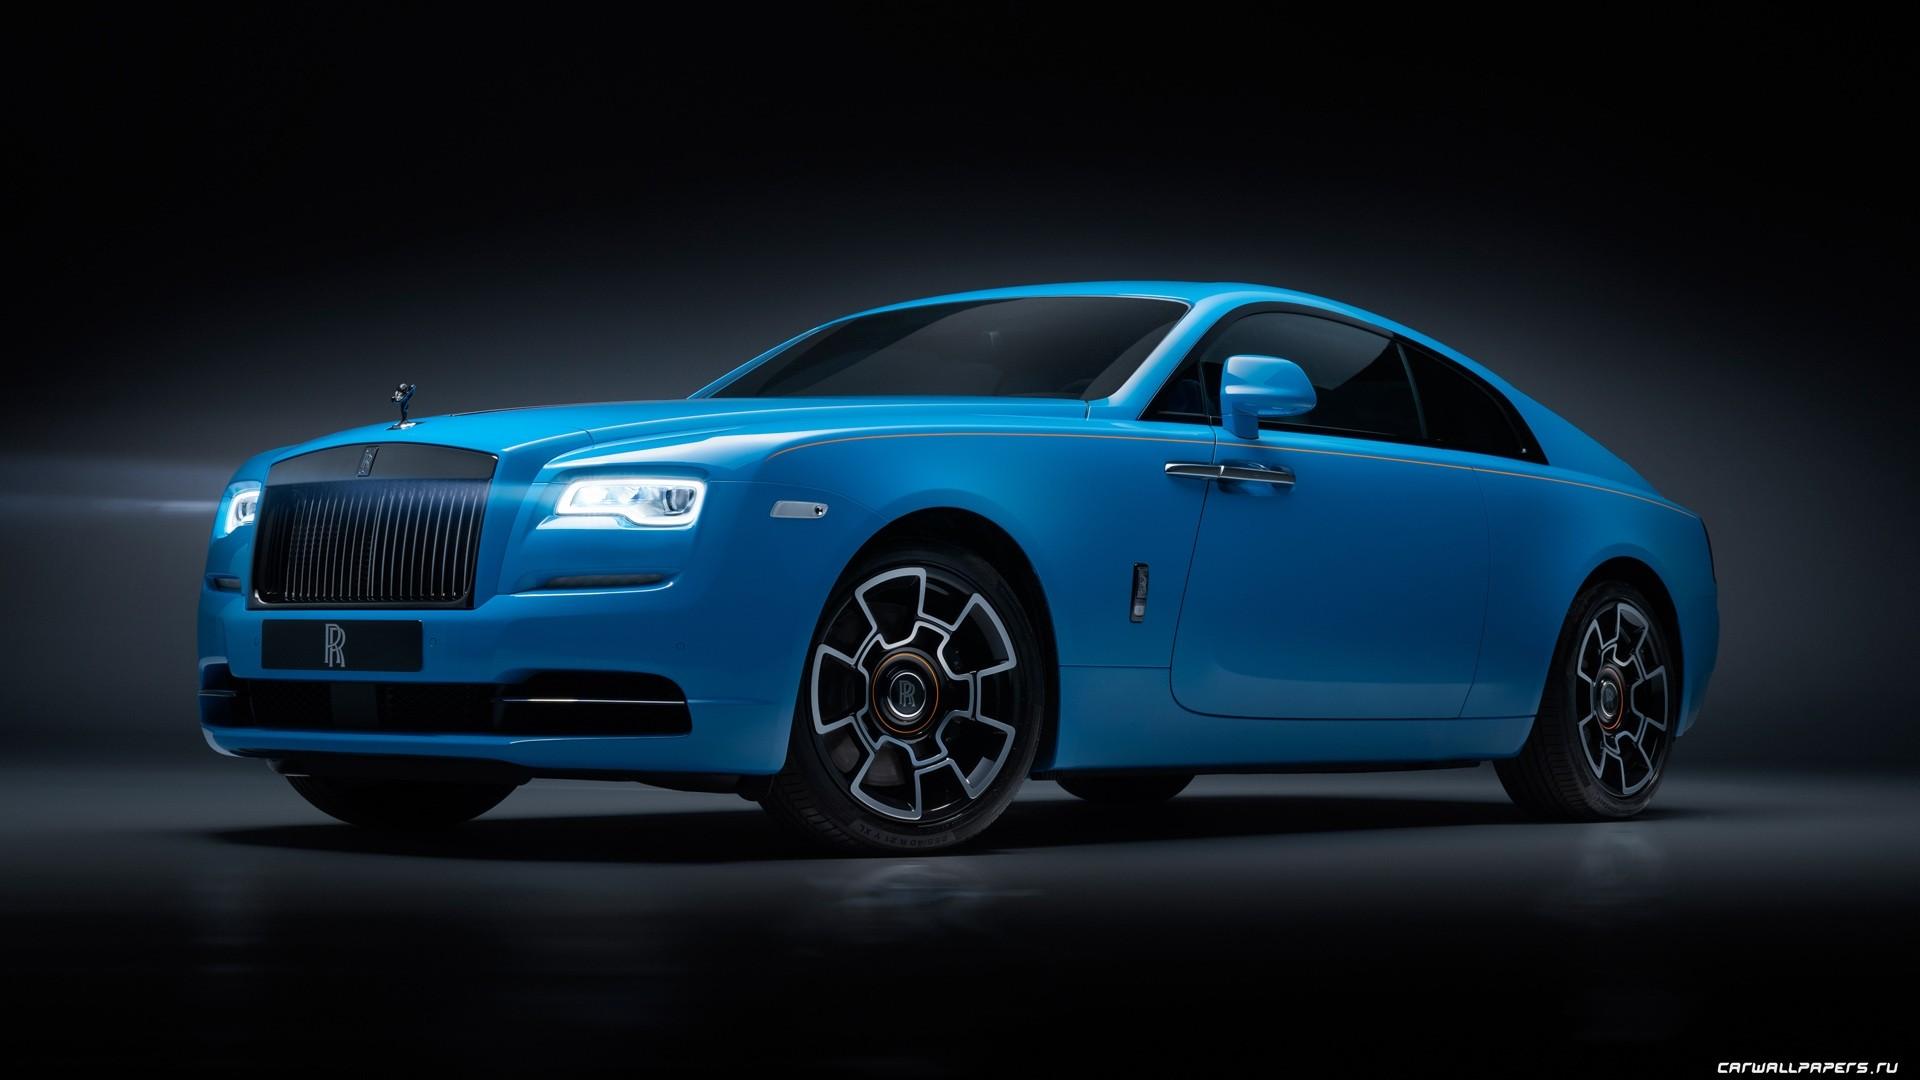 Rolls Royce Wraith Image